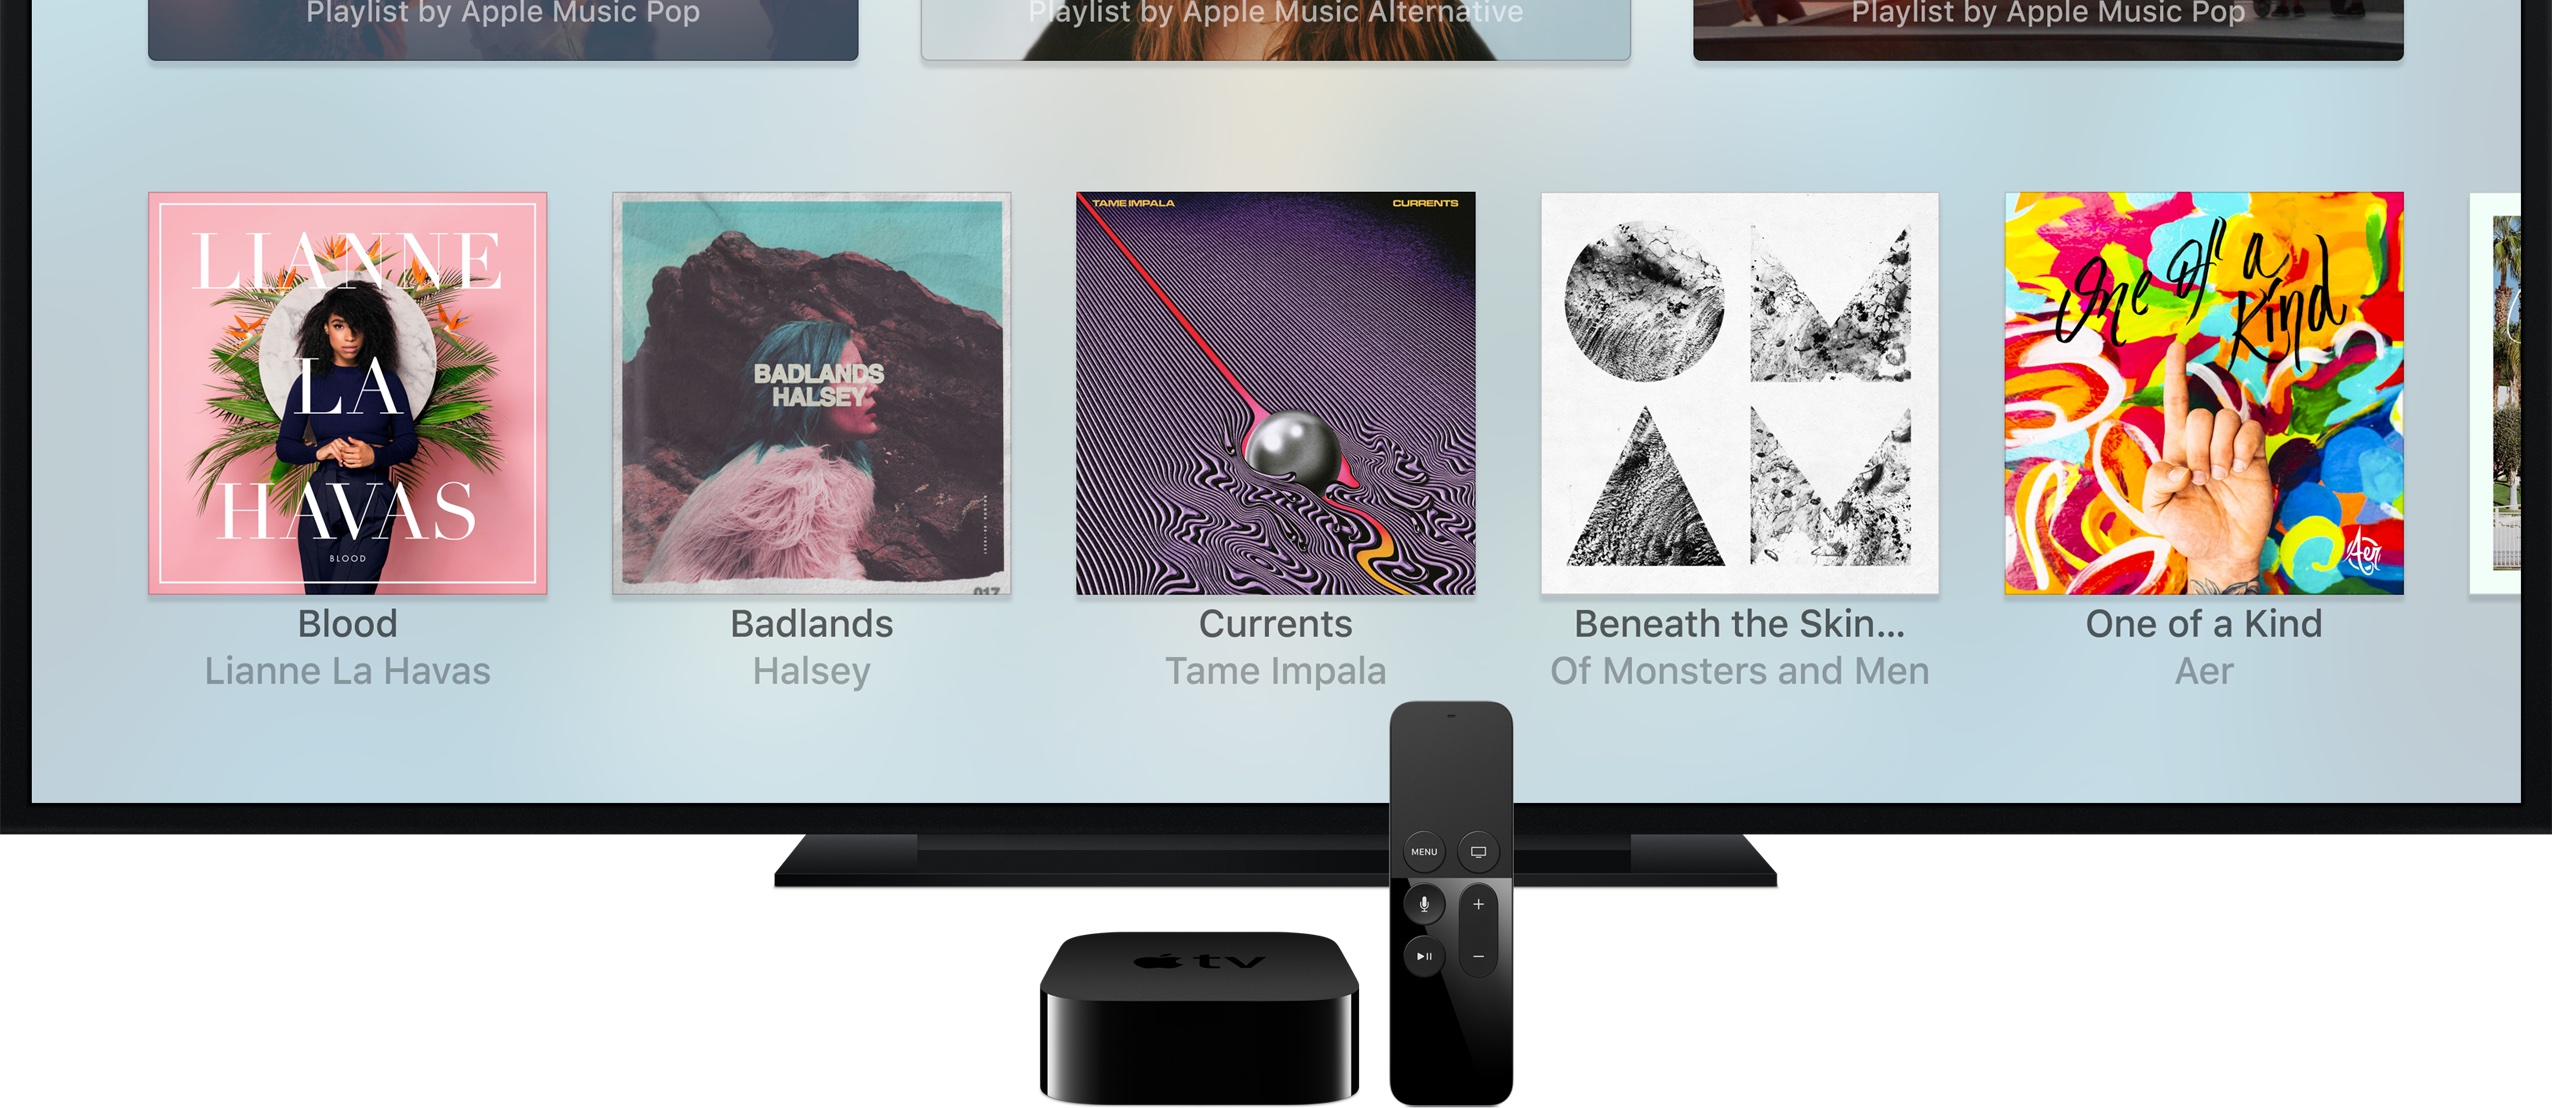 Apple TV 4 image 004